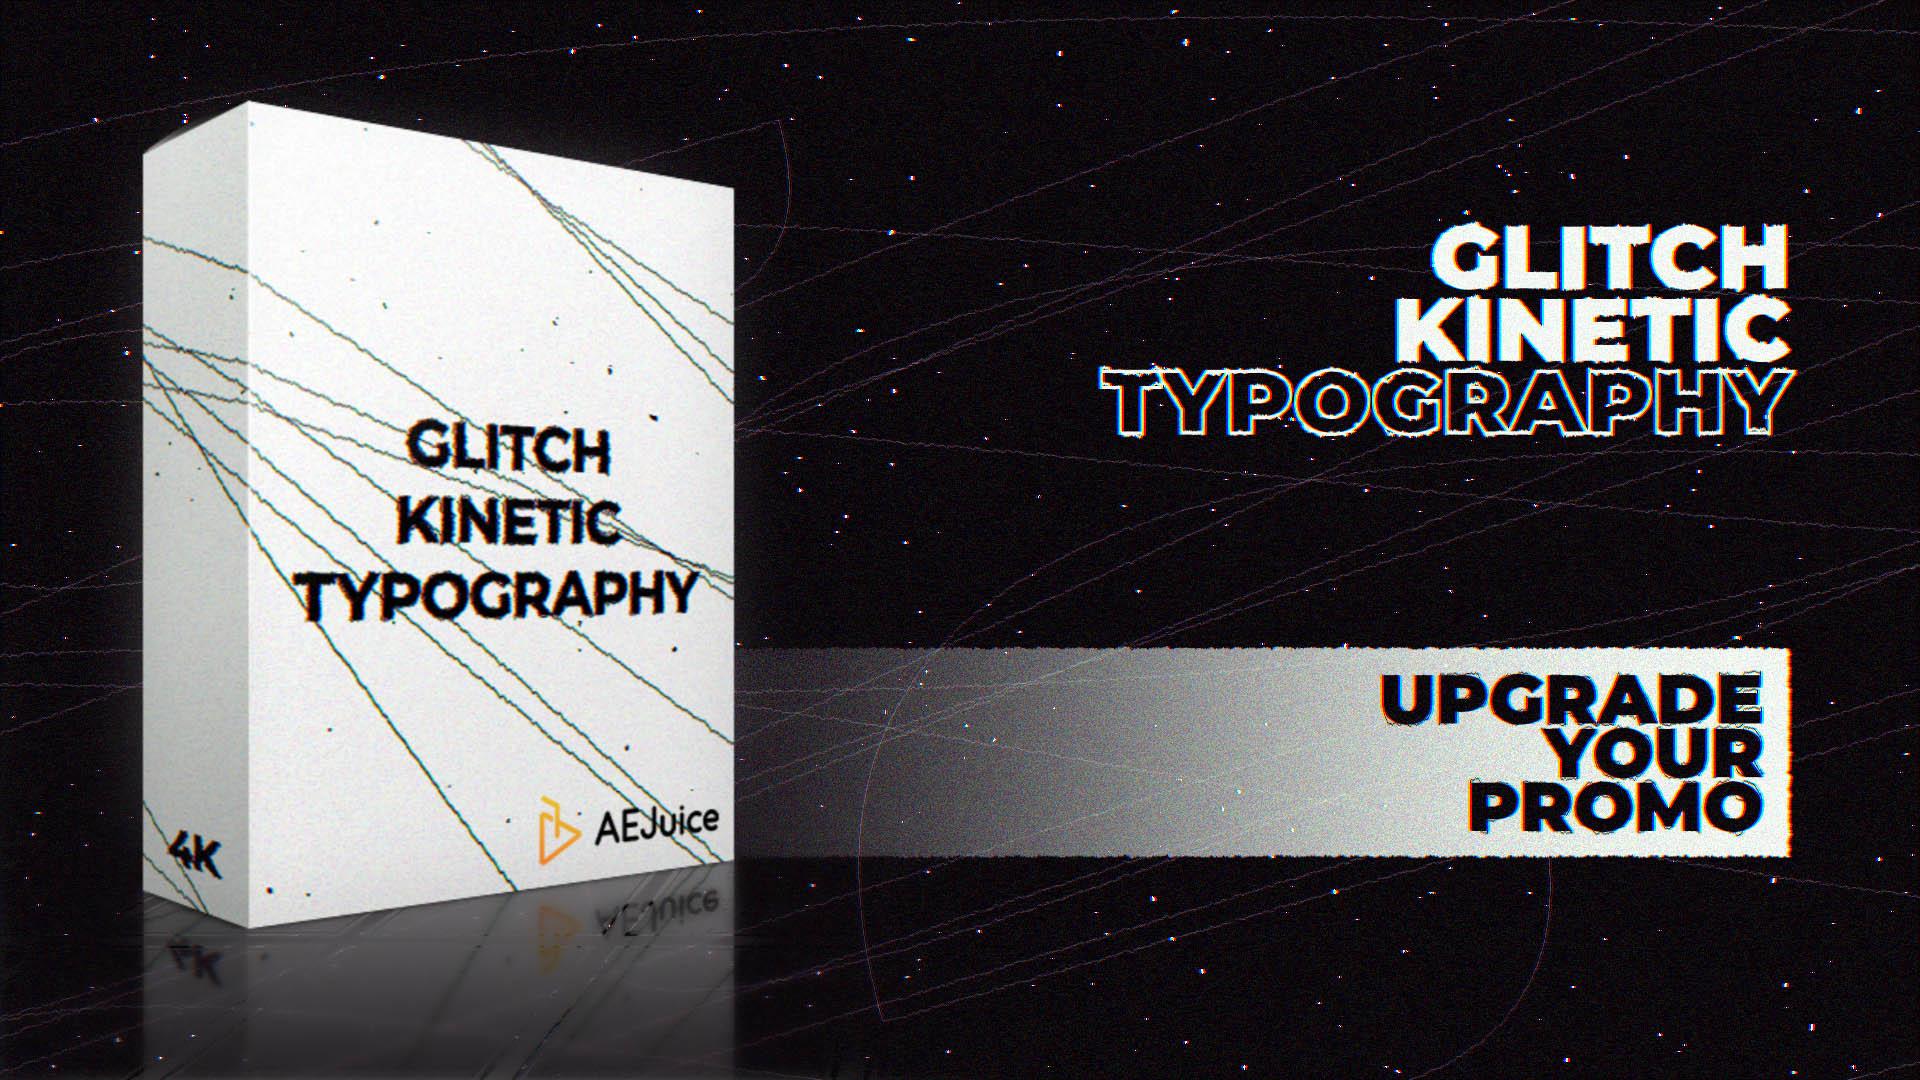 Glitch Kinetic Typography